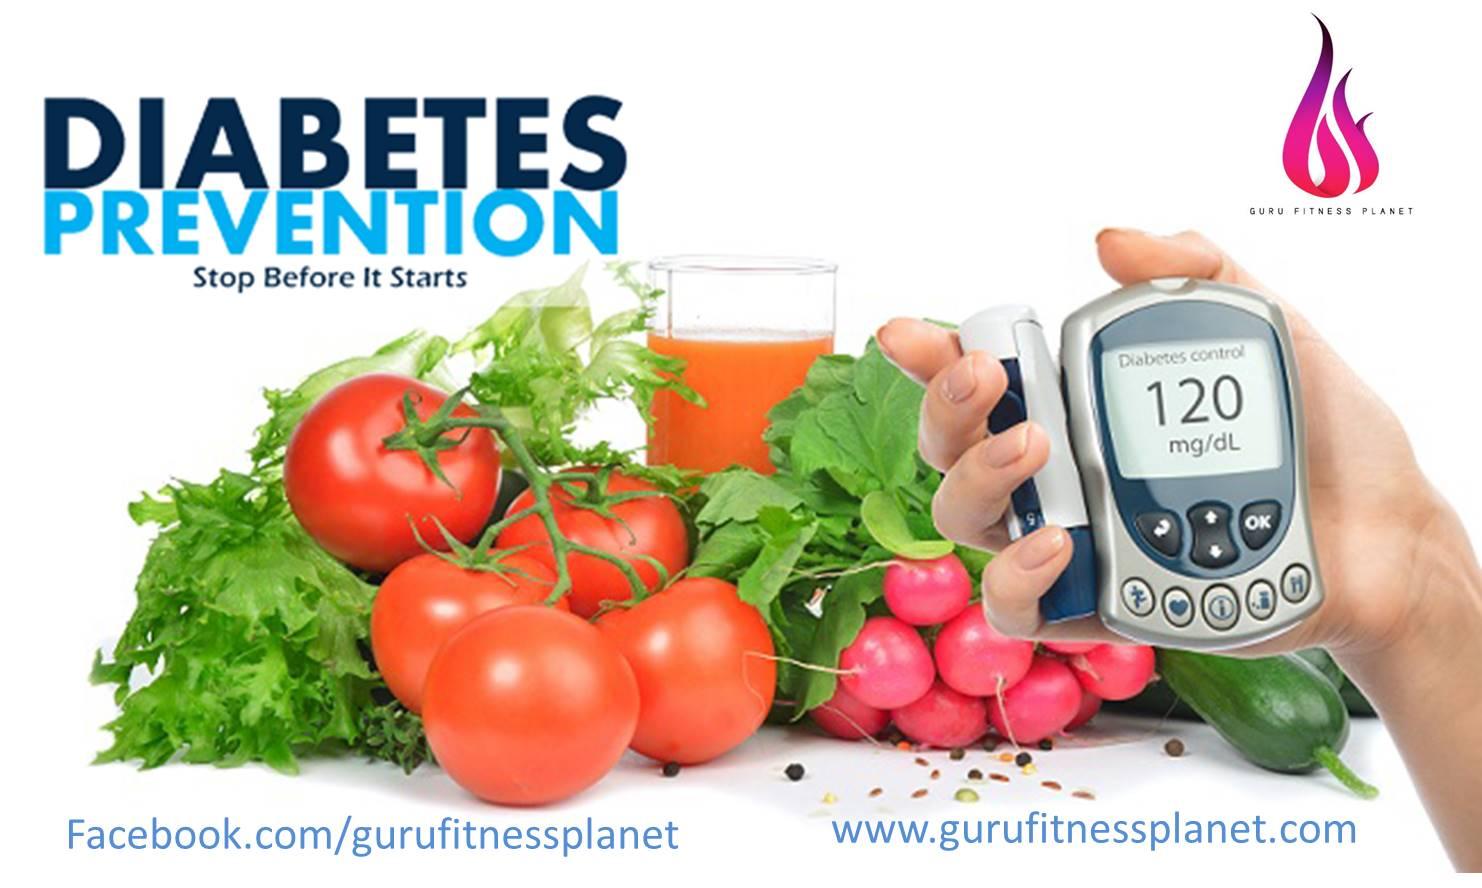 Canada Goose hats sale official - Fitness Guru: Article # 602. Diabetes Prevention